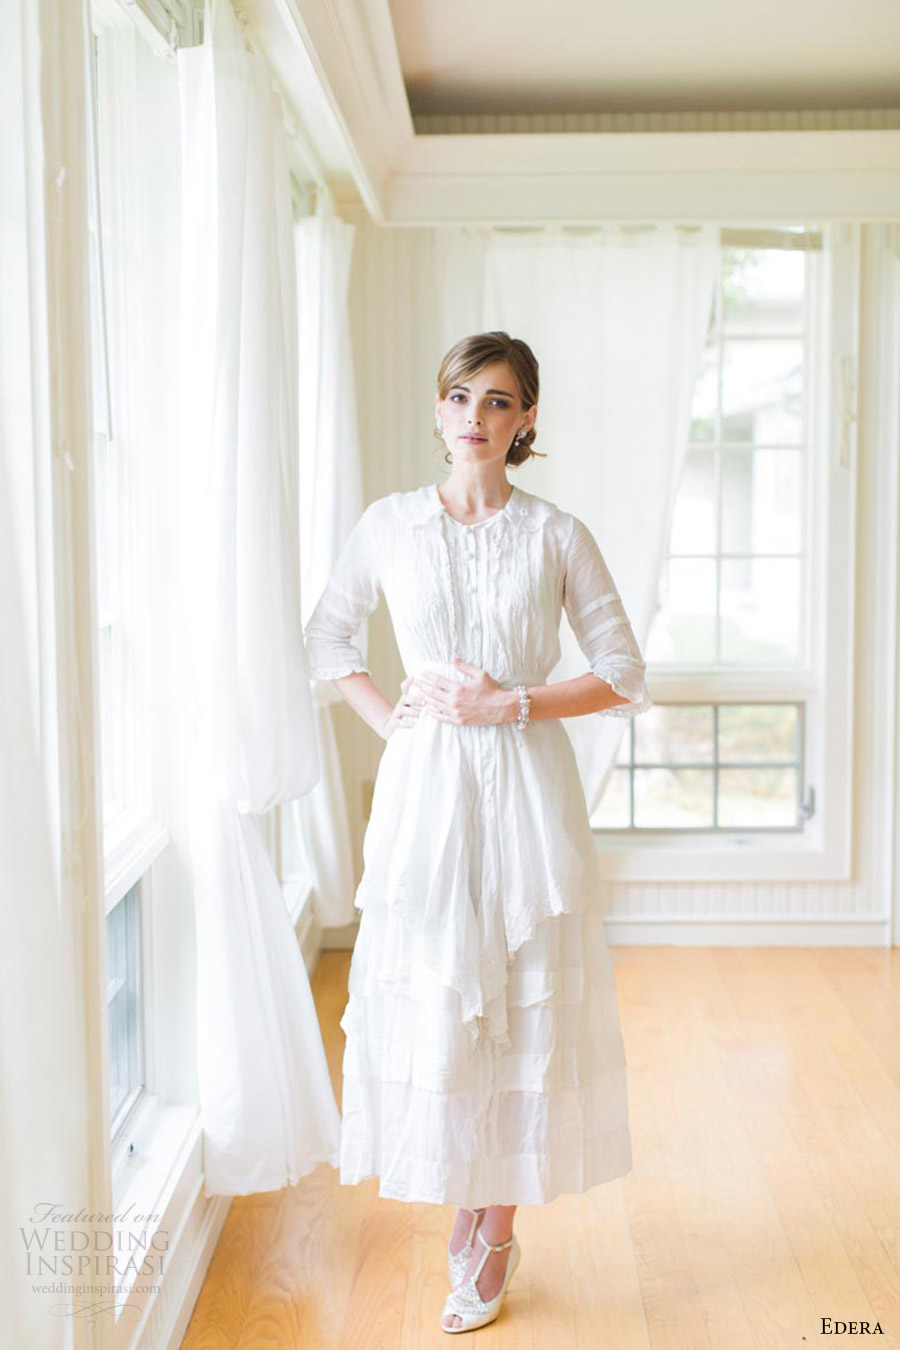 edera jewelry 2016 aquarelle bridal accessories collection love mood ashley largesse vintage gown bride bella belle shoes